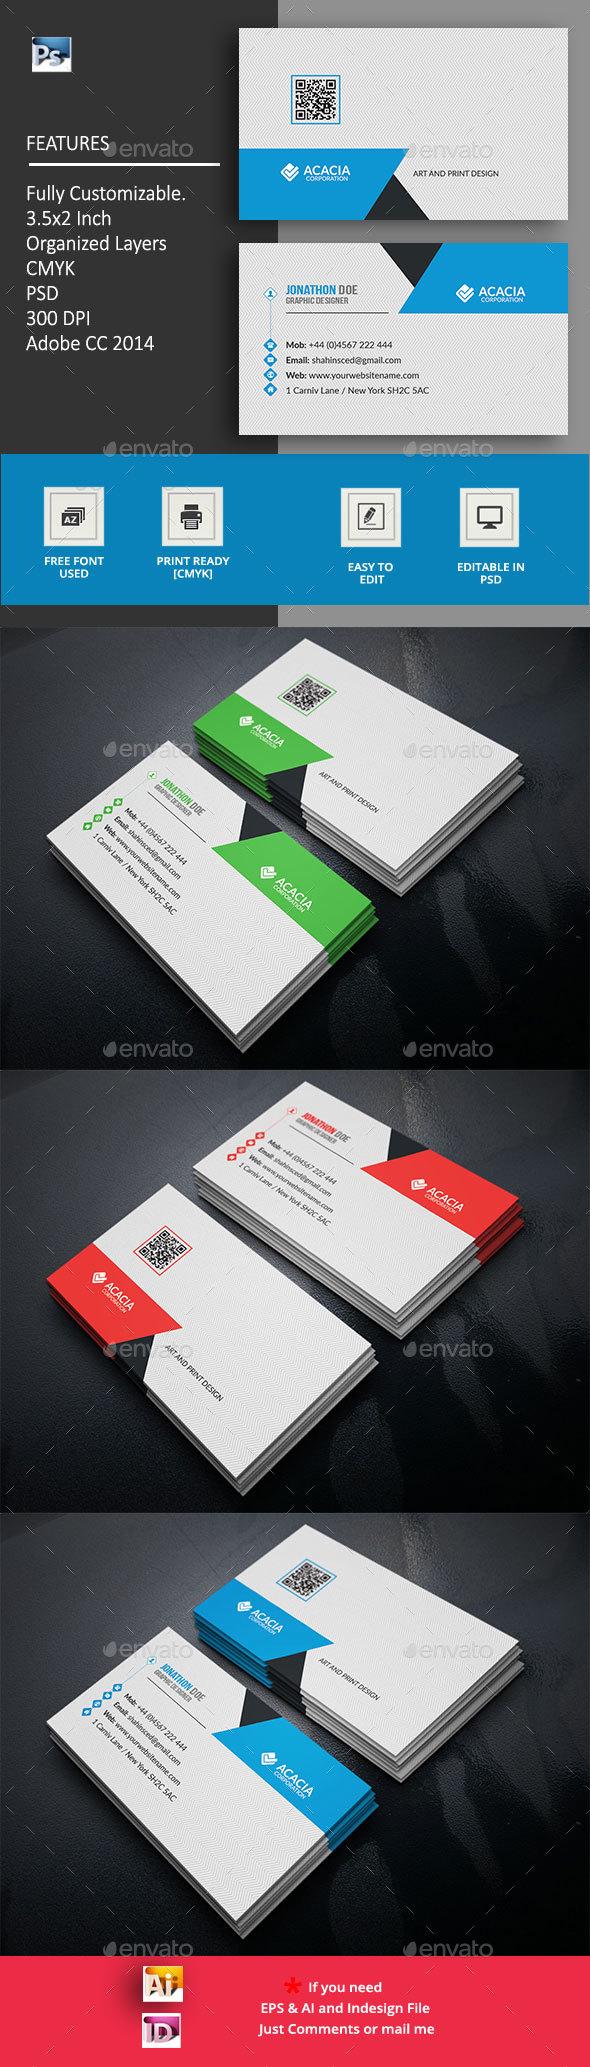 Shapu Business Card - Creative Business Cards